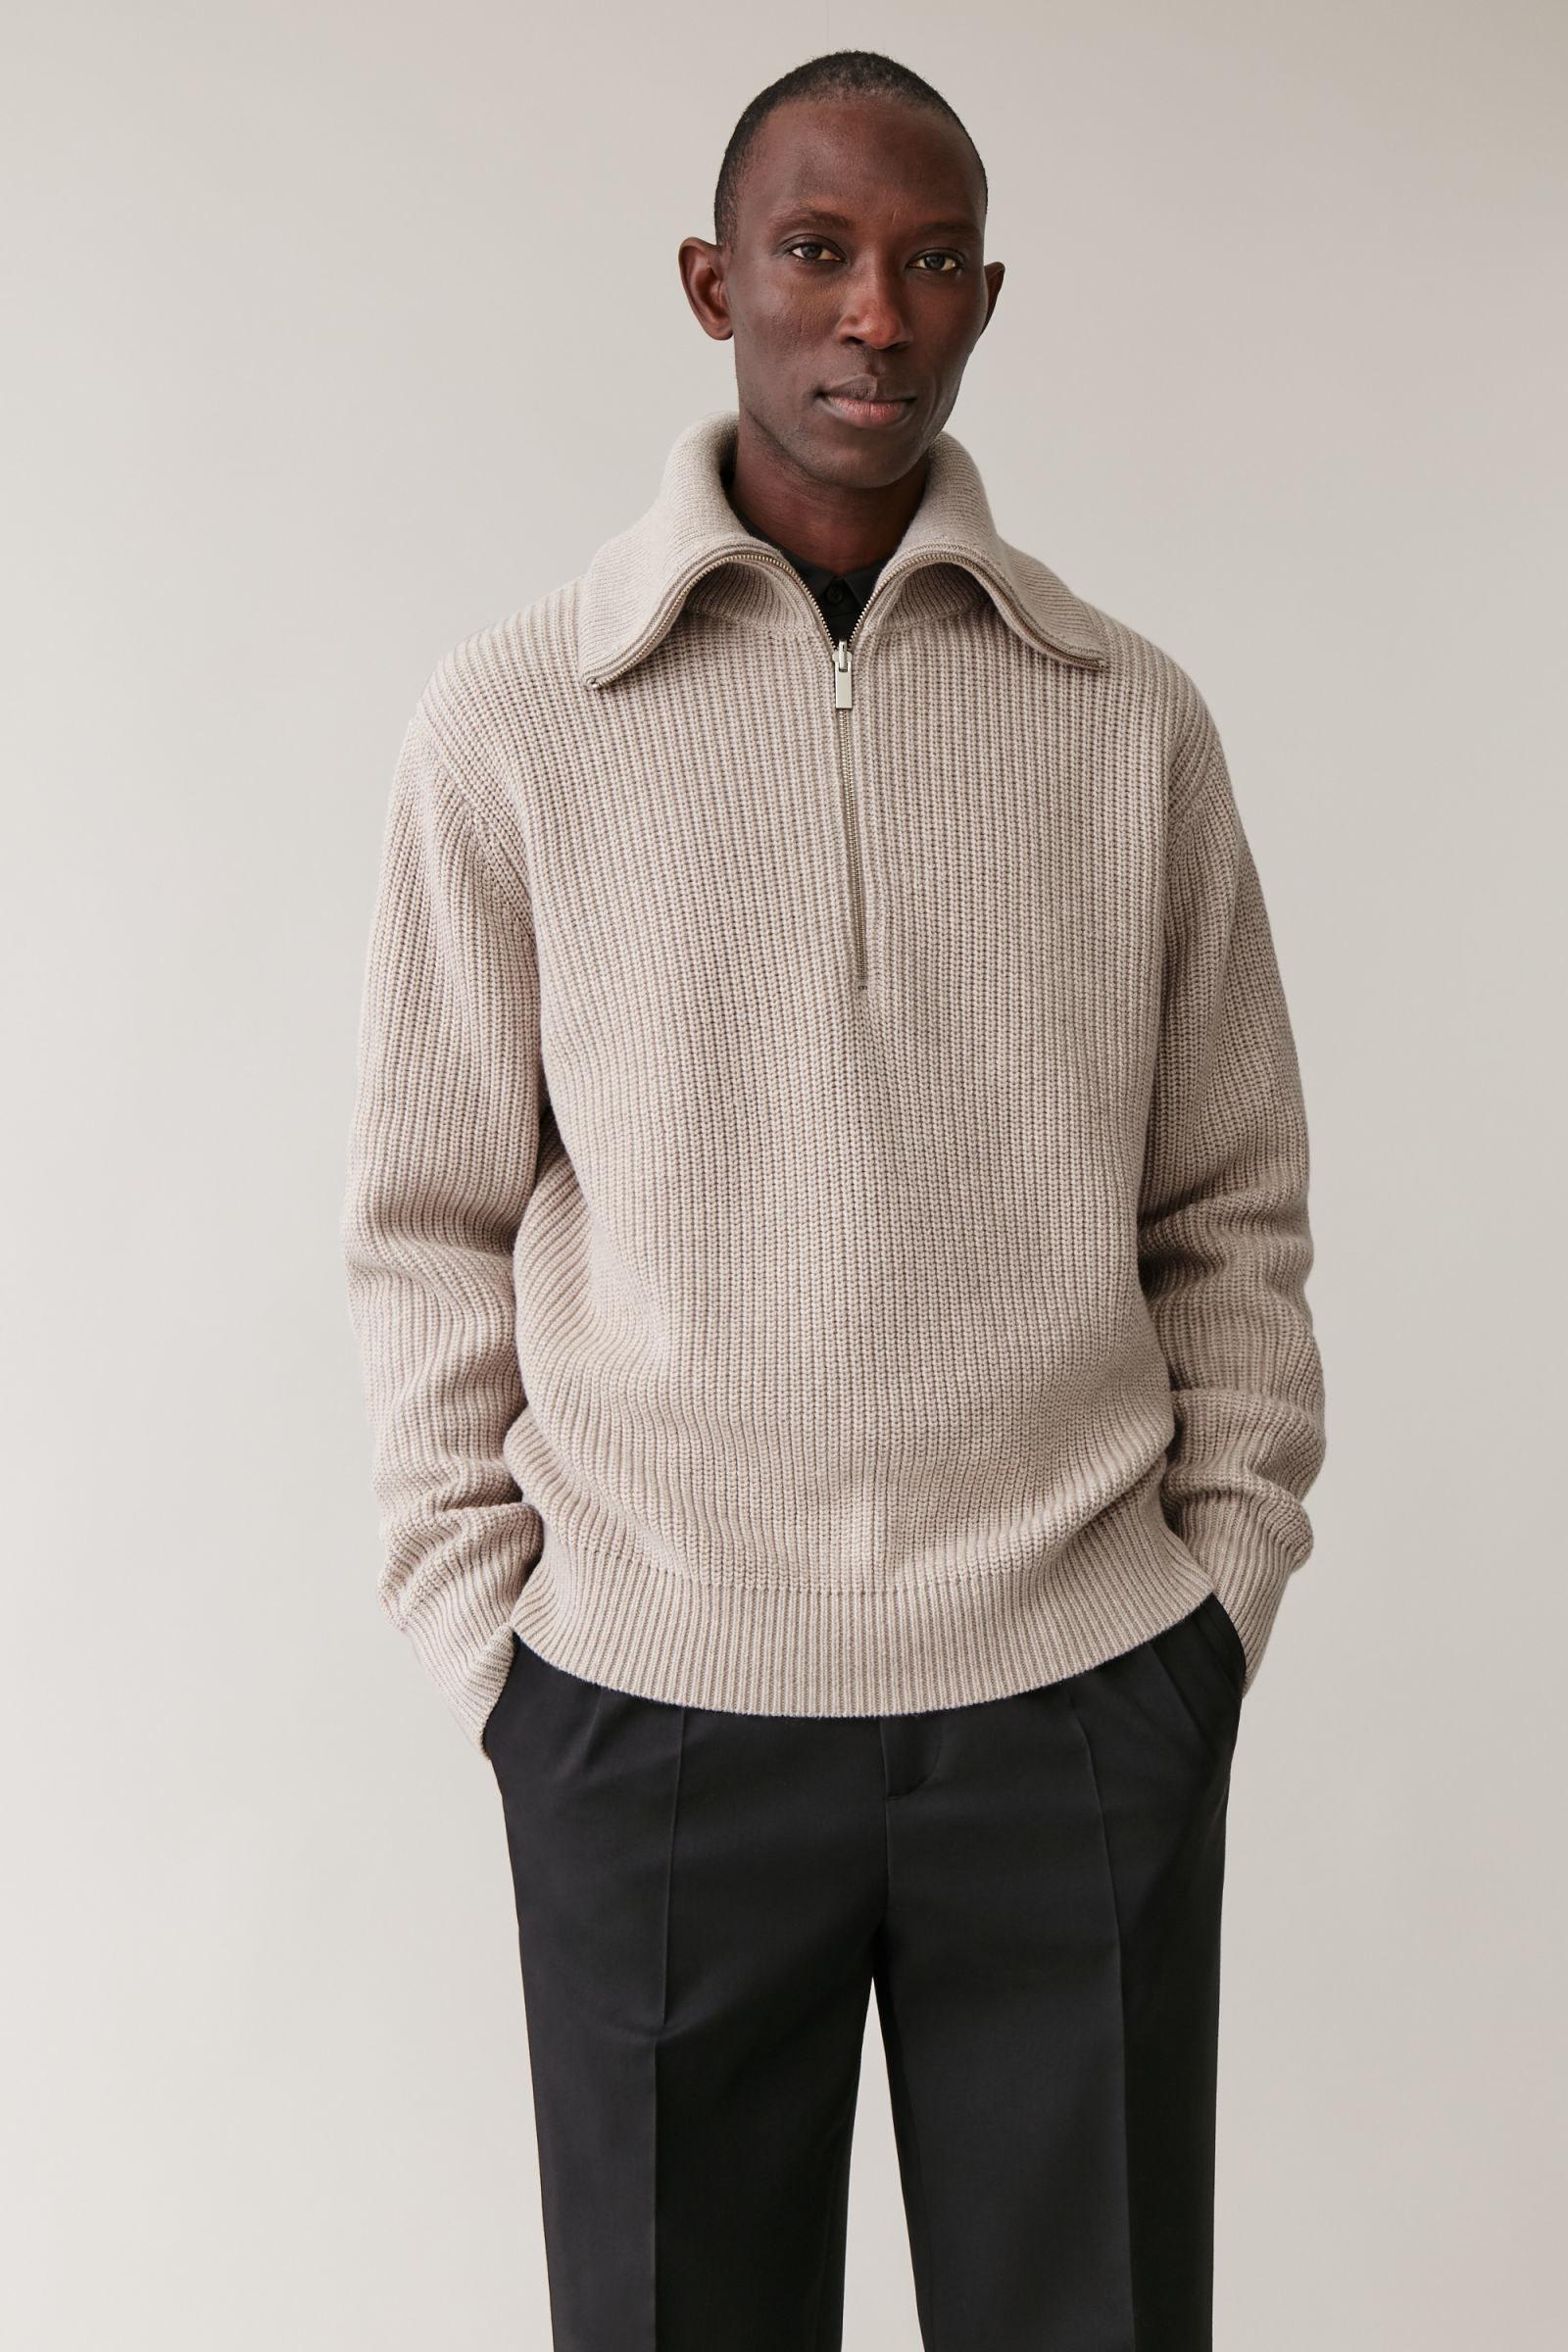 YUNY Men Textured Baggy Style Autumn Winter Long Sleeve Knitwear 2 L